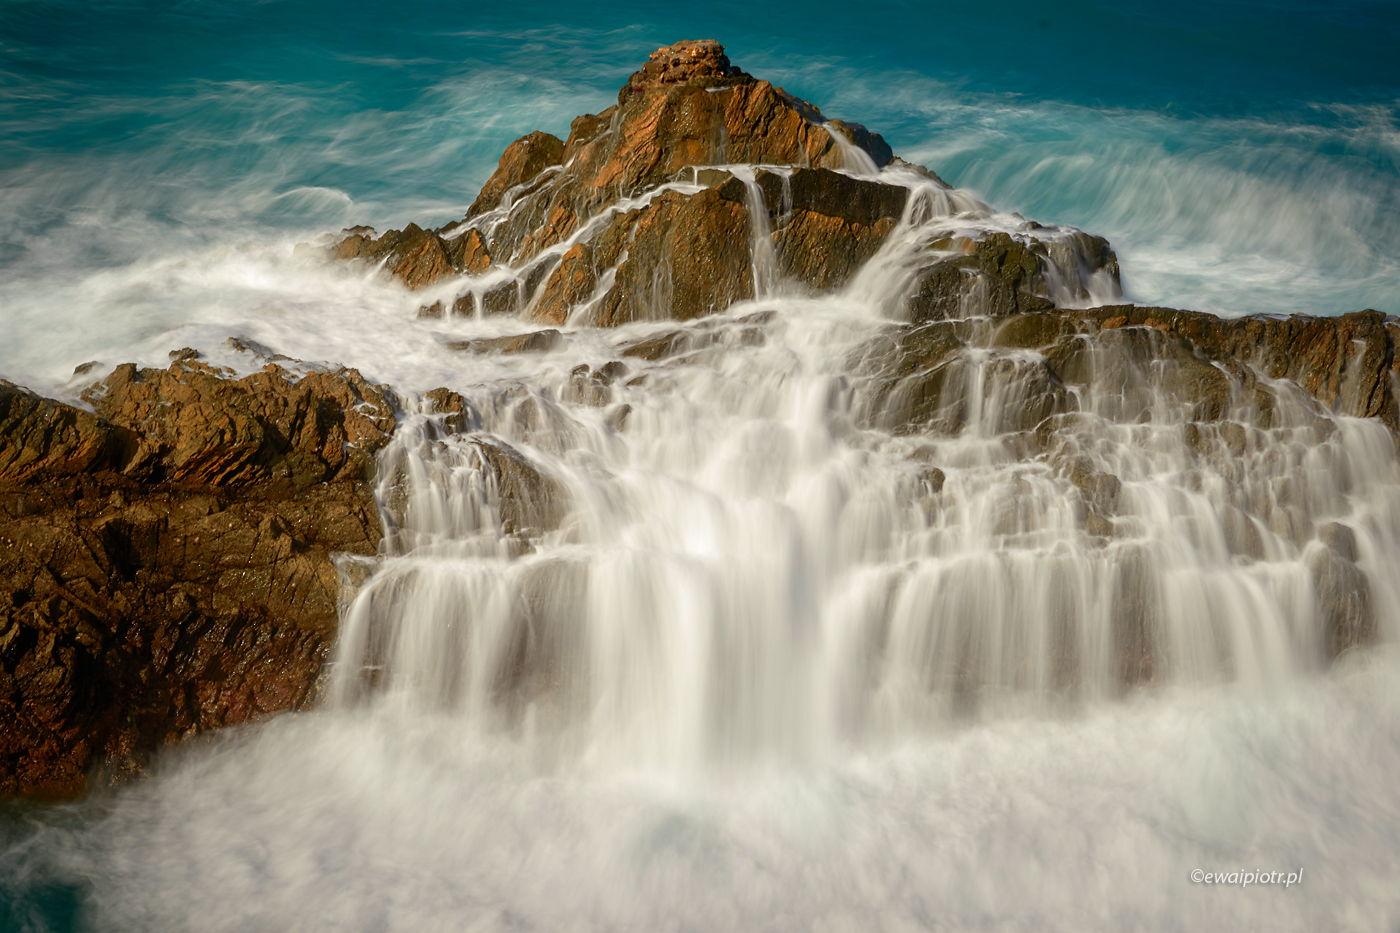 Morski wodospad na Wyspach Kanaryjskich